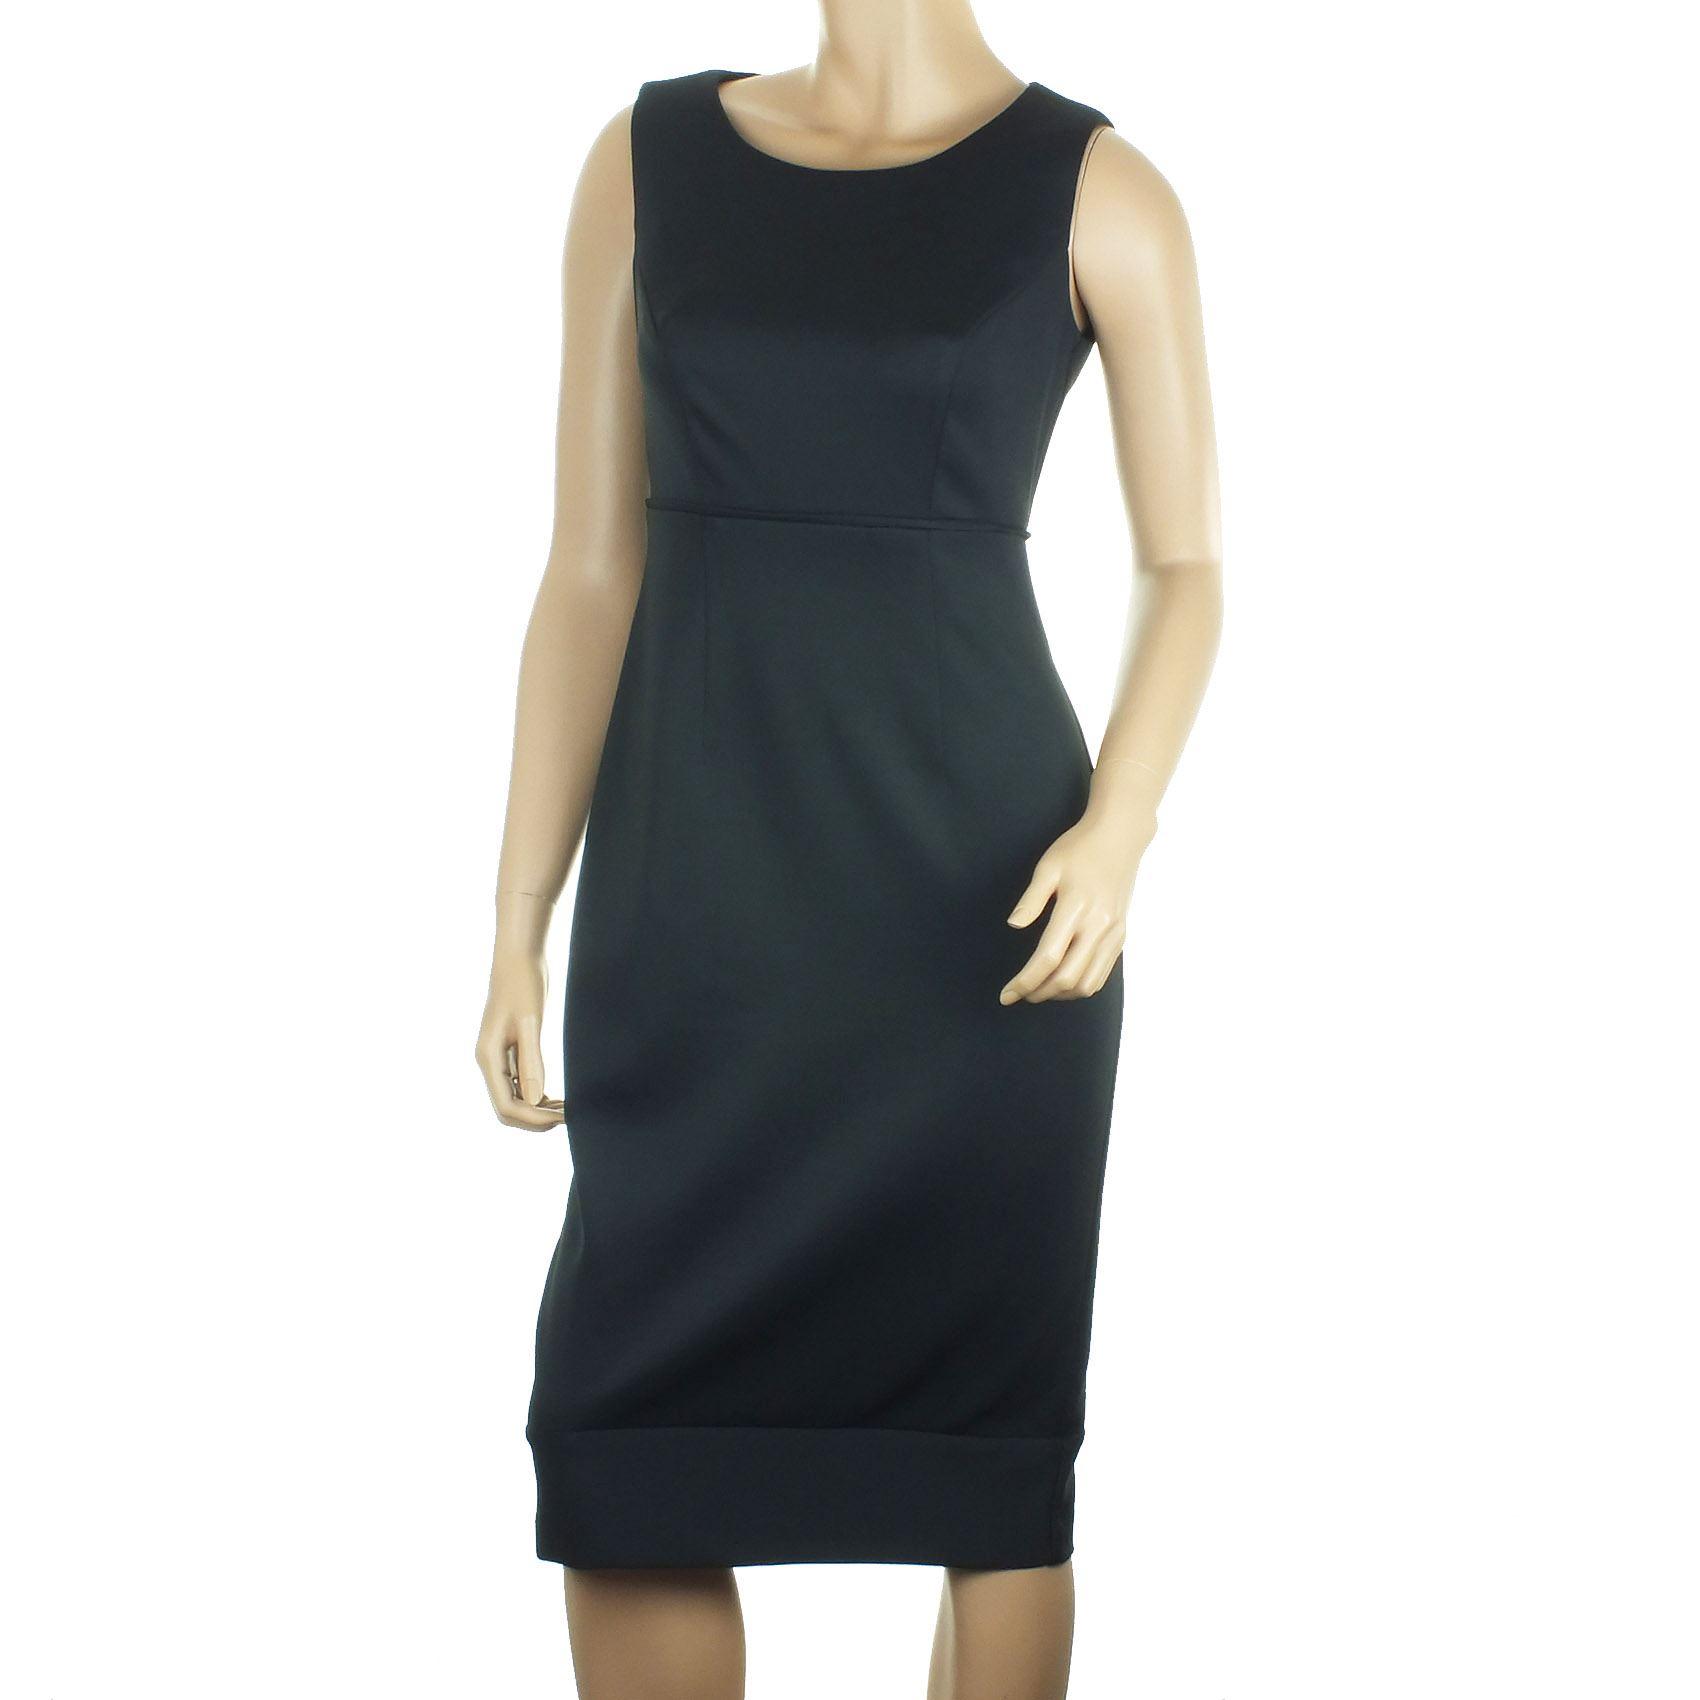 Black dress debenhams - Ex Debenhams Black Dress Pencil Wiggle Scuba Midi Party Ladies Stretch Size 8 20